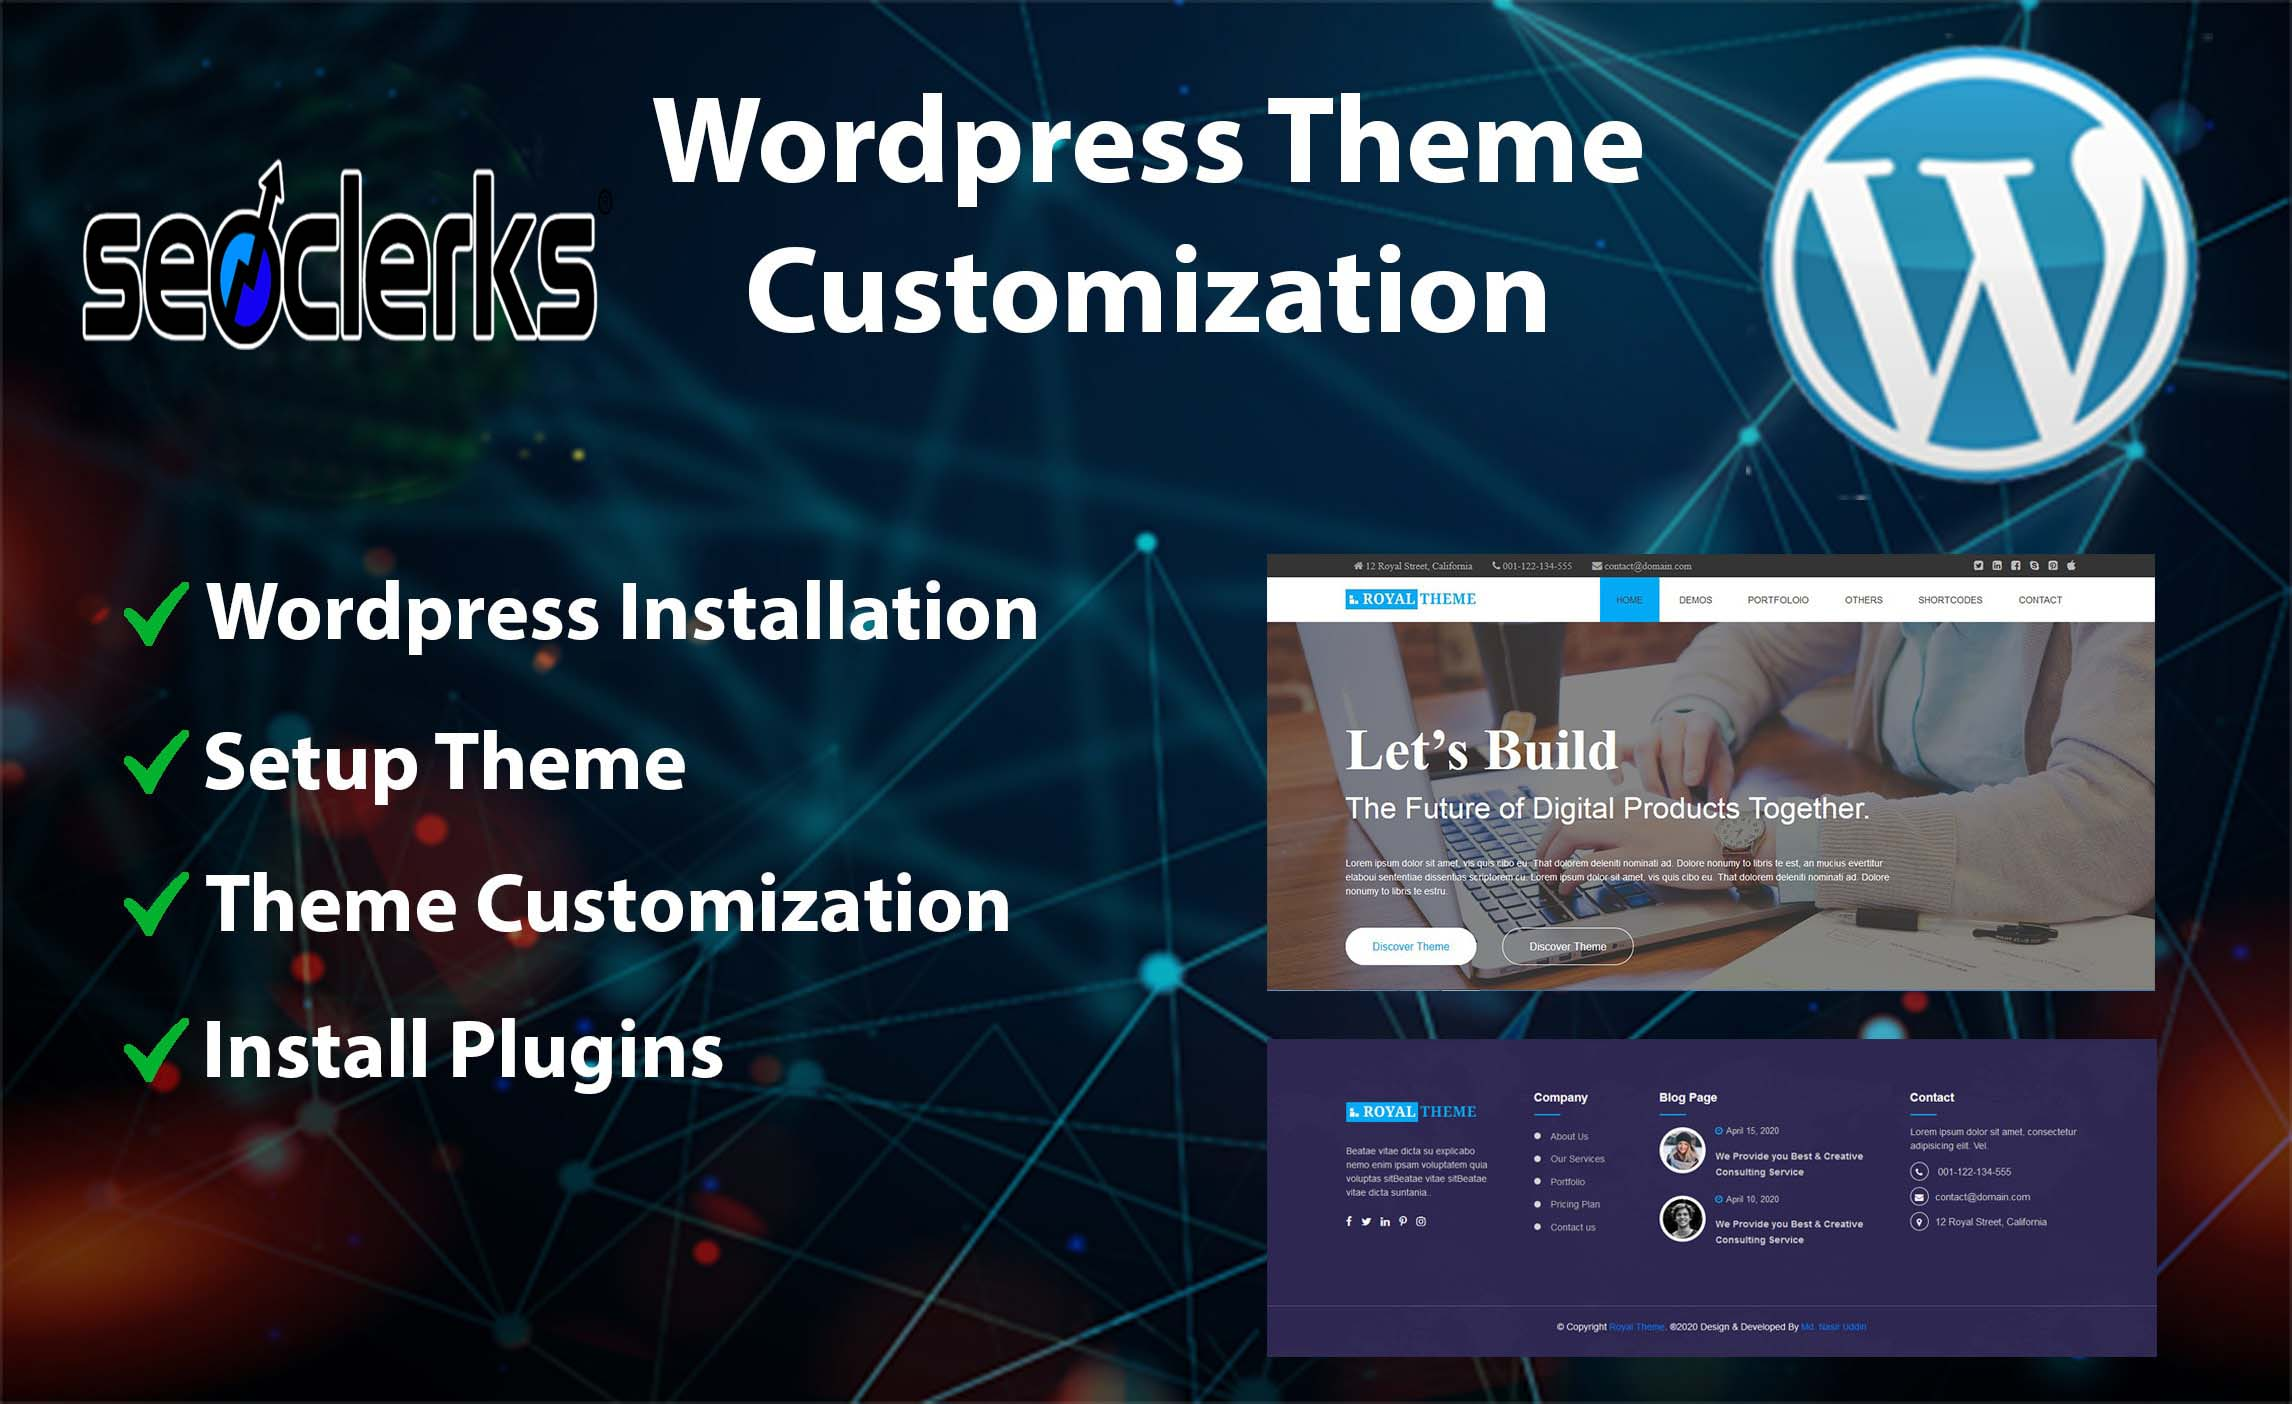 I can WordPress,  themes install,  customization plugin setup